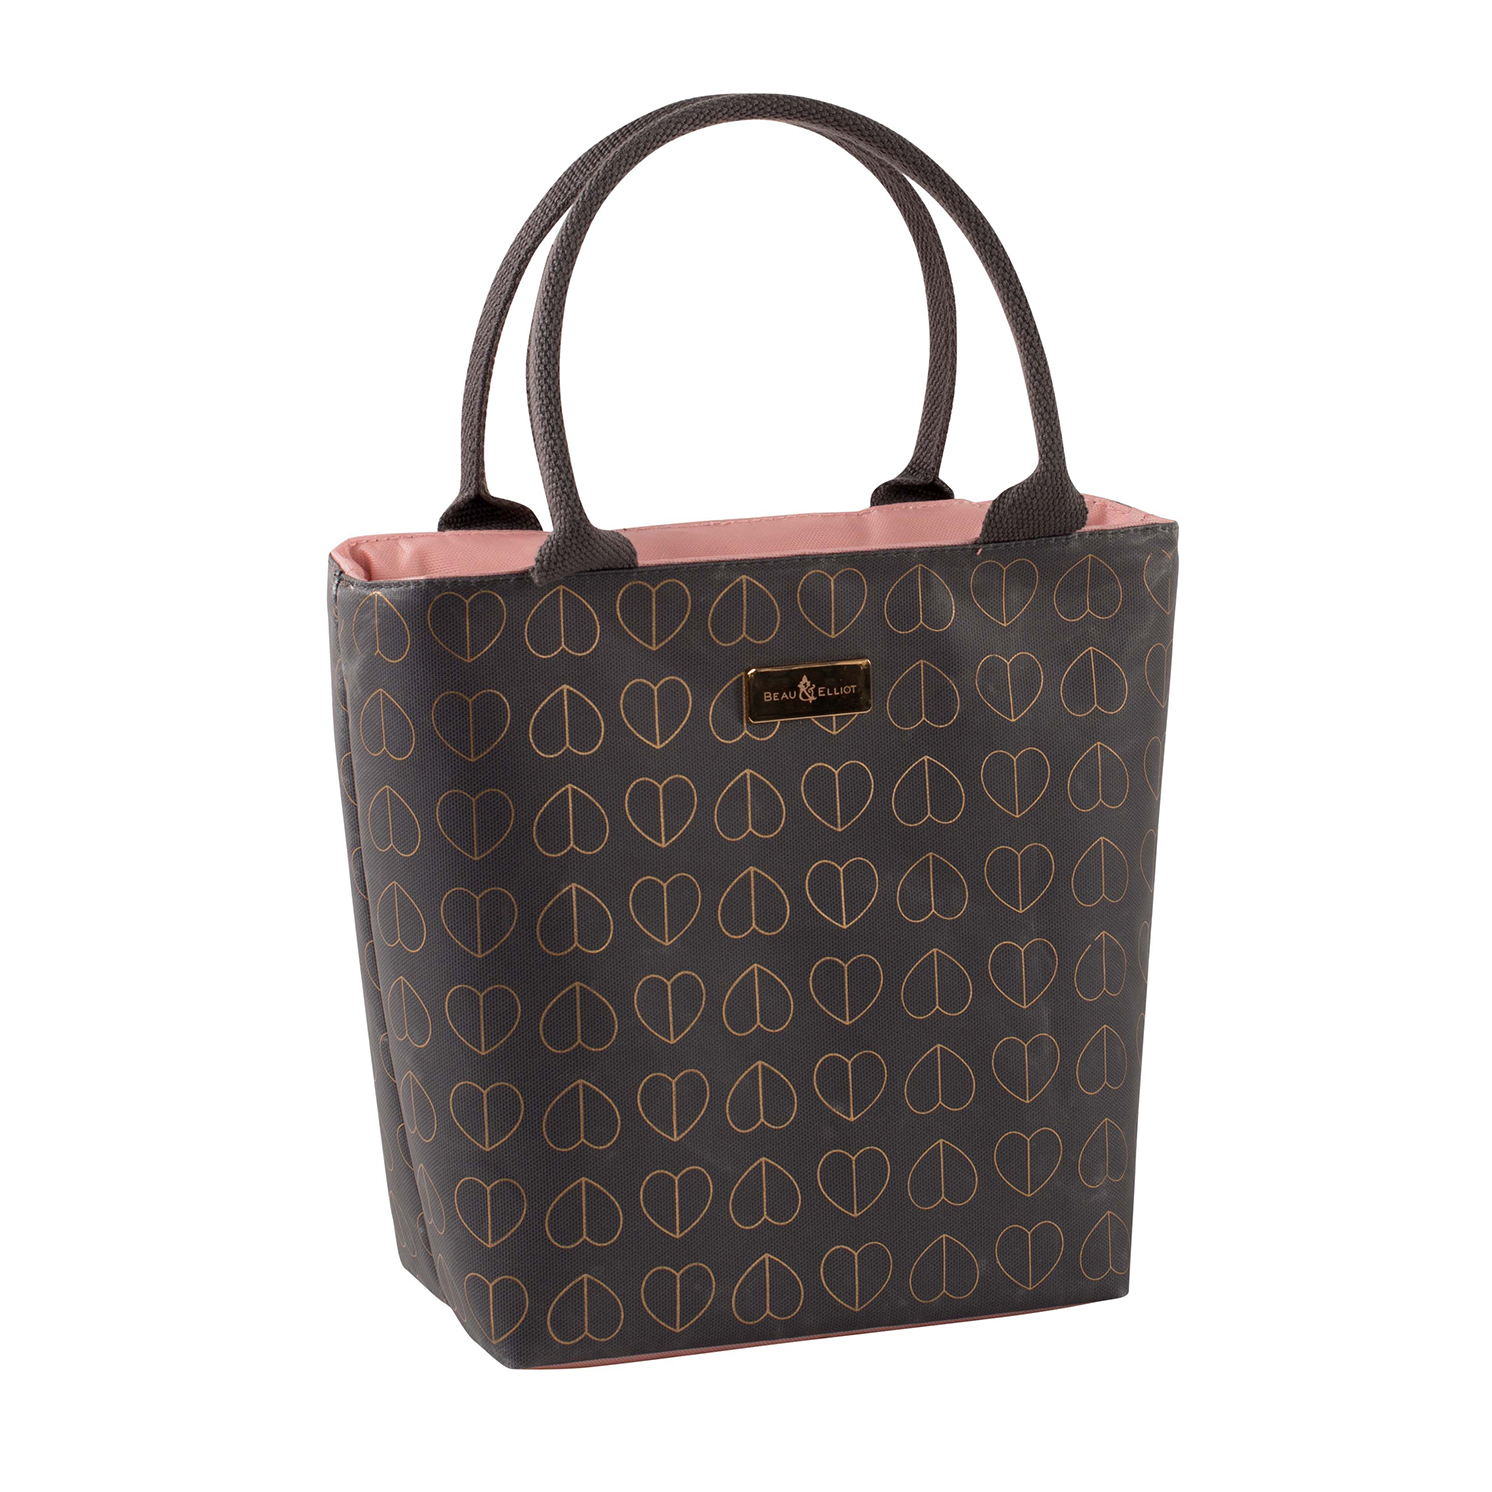 Beau & Elliot – Dove Grey Insulated Lunch Tote Bag & Pink Blush Travel Mug